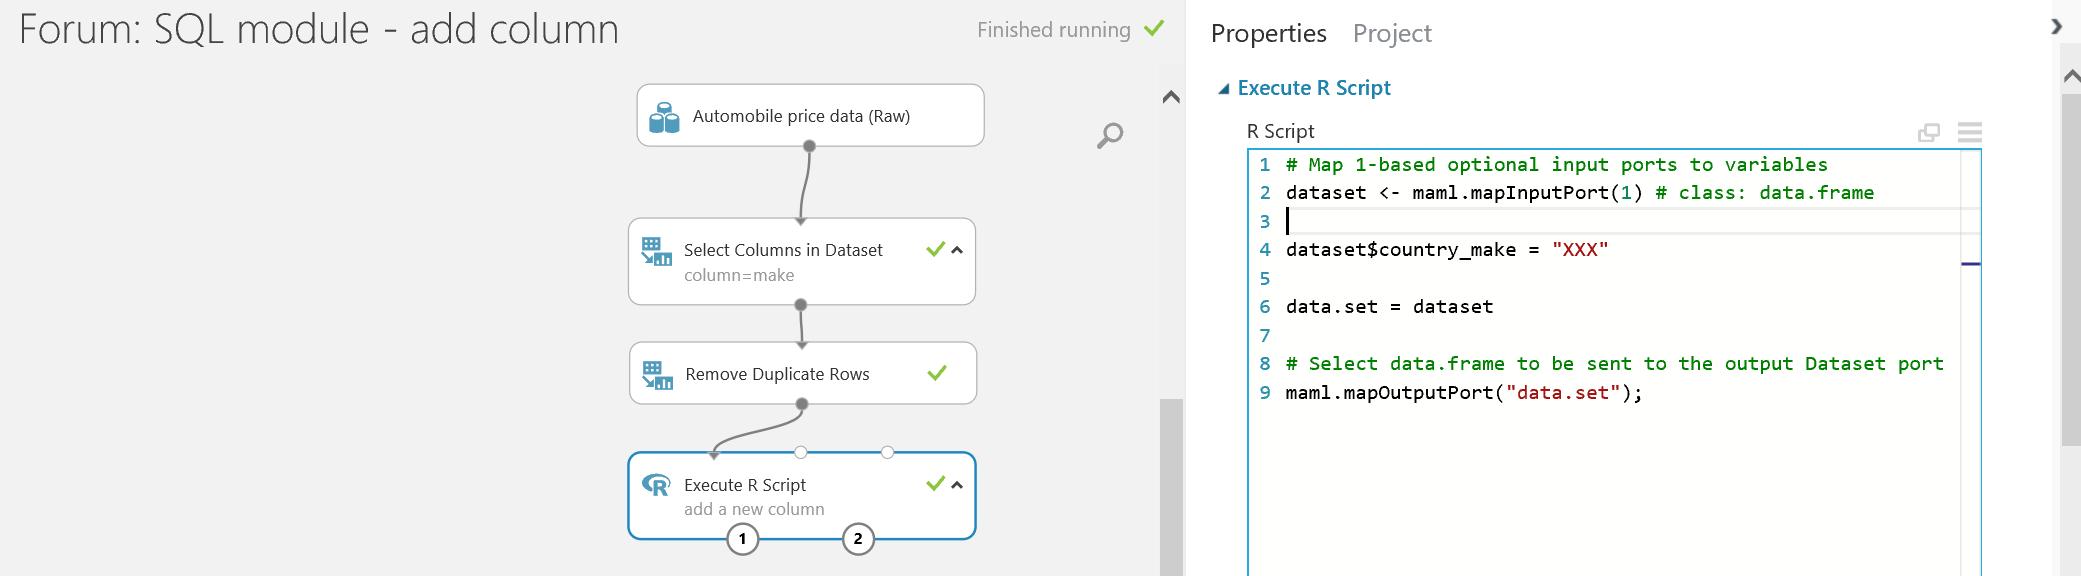 Adding a column via Apply SQL Transformation in Azure ML Studio